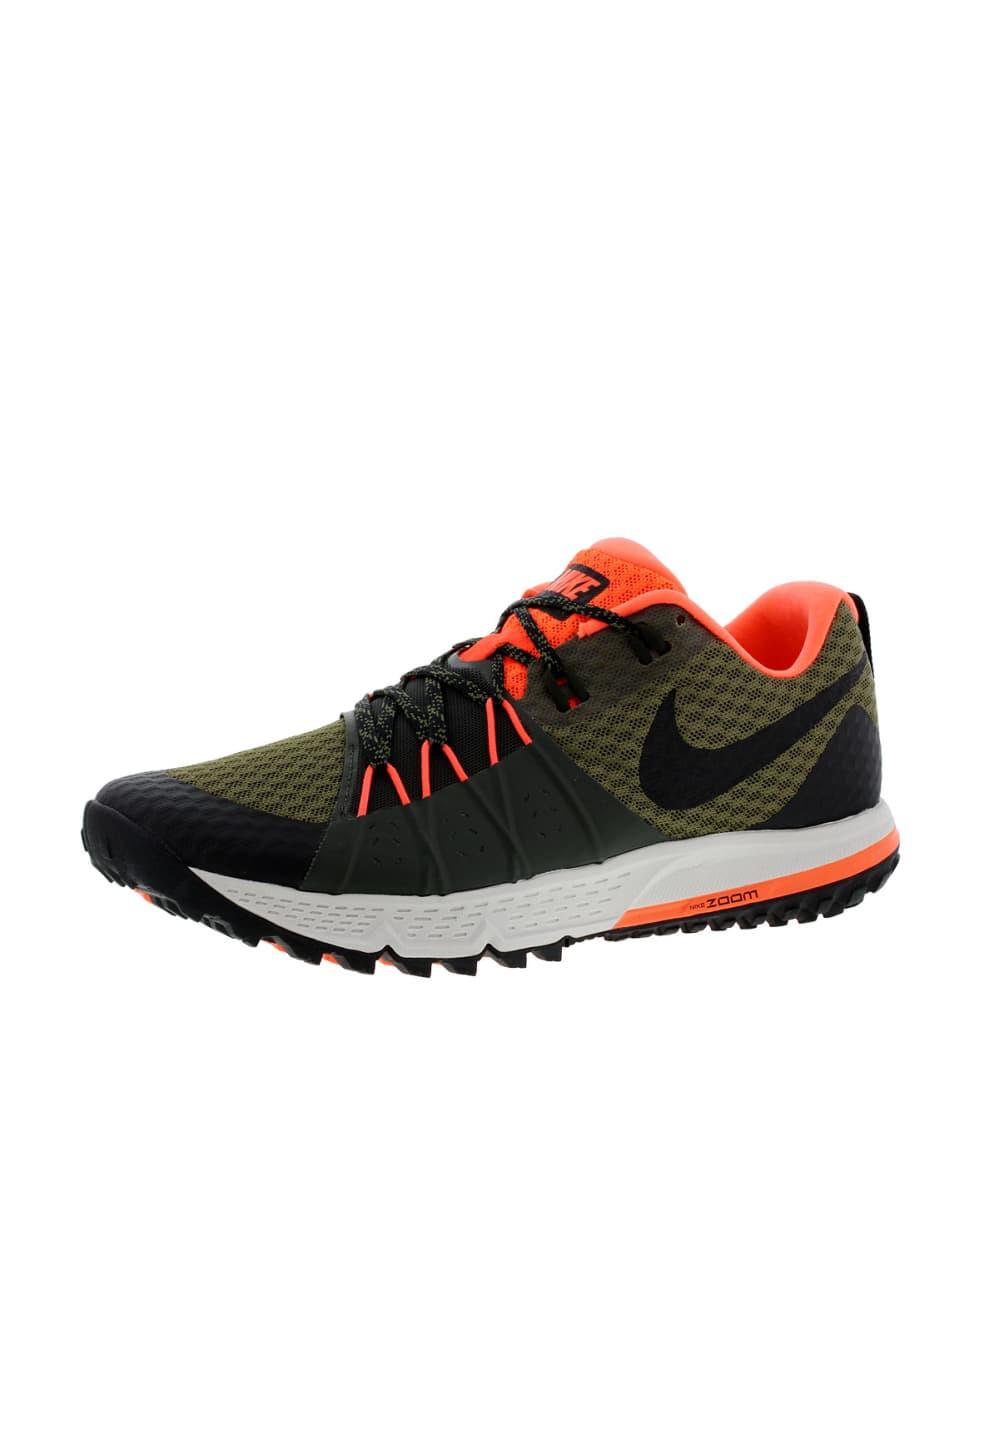 plus de photos f8094 b5d8f Nike Air Zoom Wildhorse 4 - Chaussures running pour Homme ...